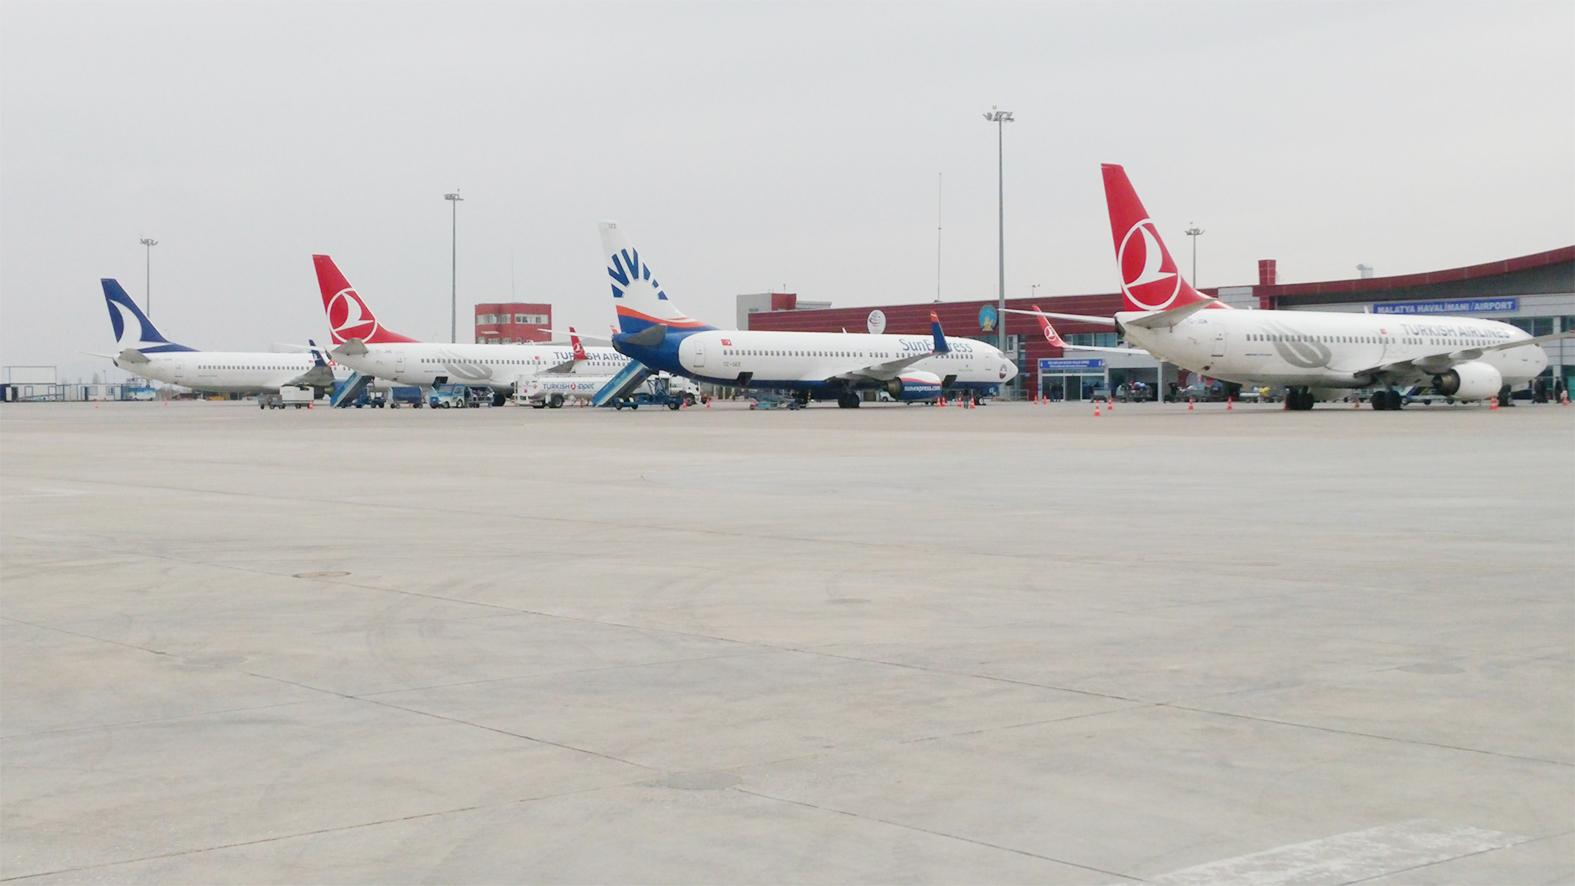 MART AYINDA MALATYA HAVALİMANI'NDA 67.108 YOLCUYA HİZMET VERİLDİ